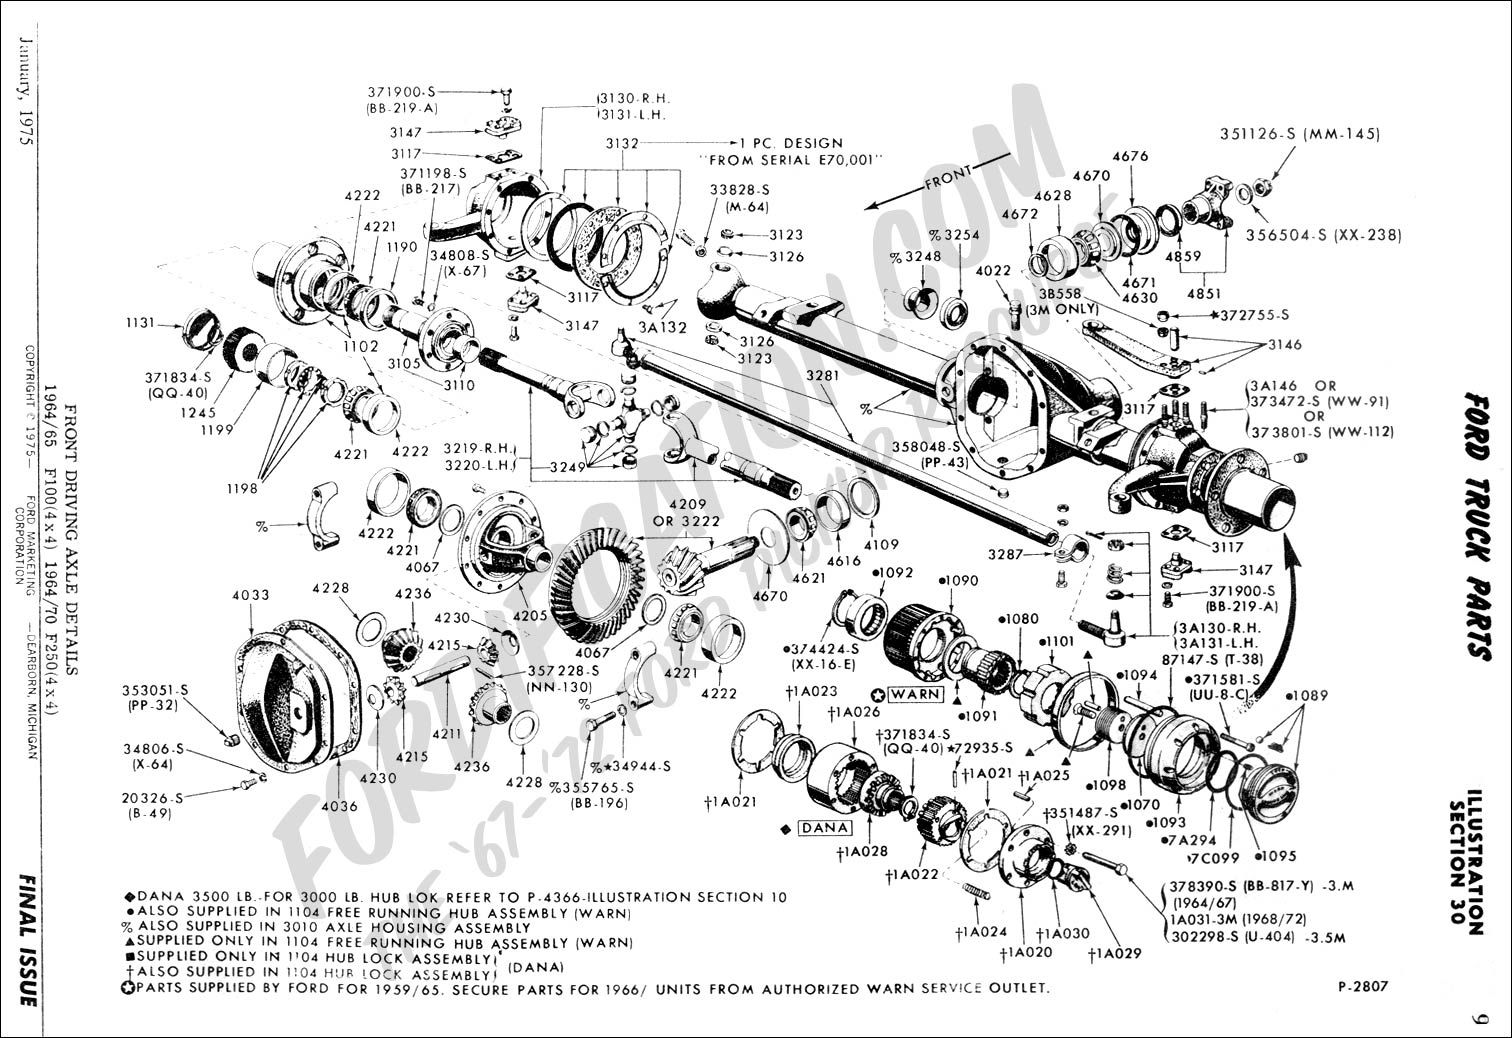 Ford F 250 Front End Parts Diagram | Farm Power | Dodge diesel, Automatic transmission, Dodge